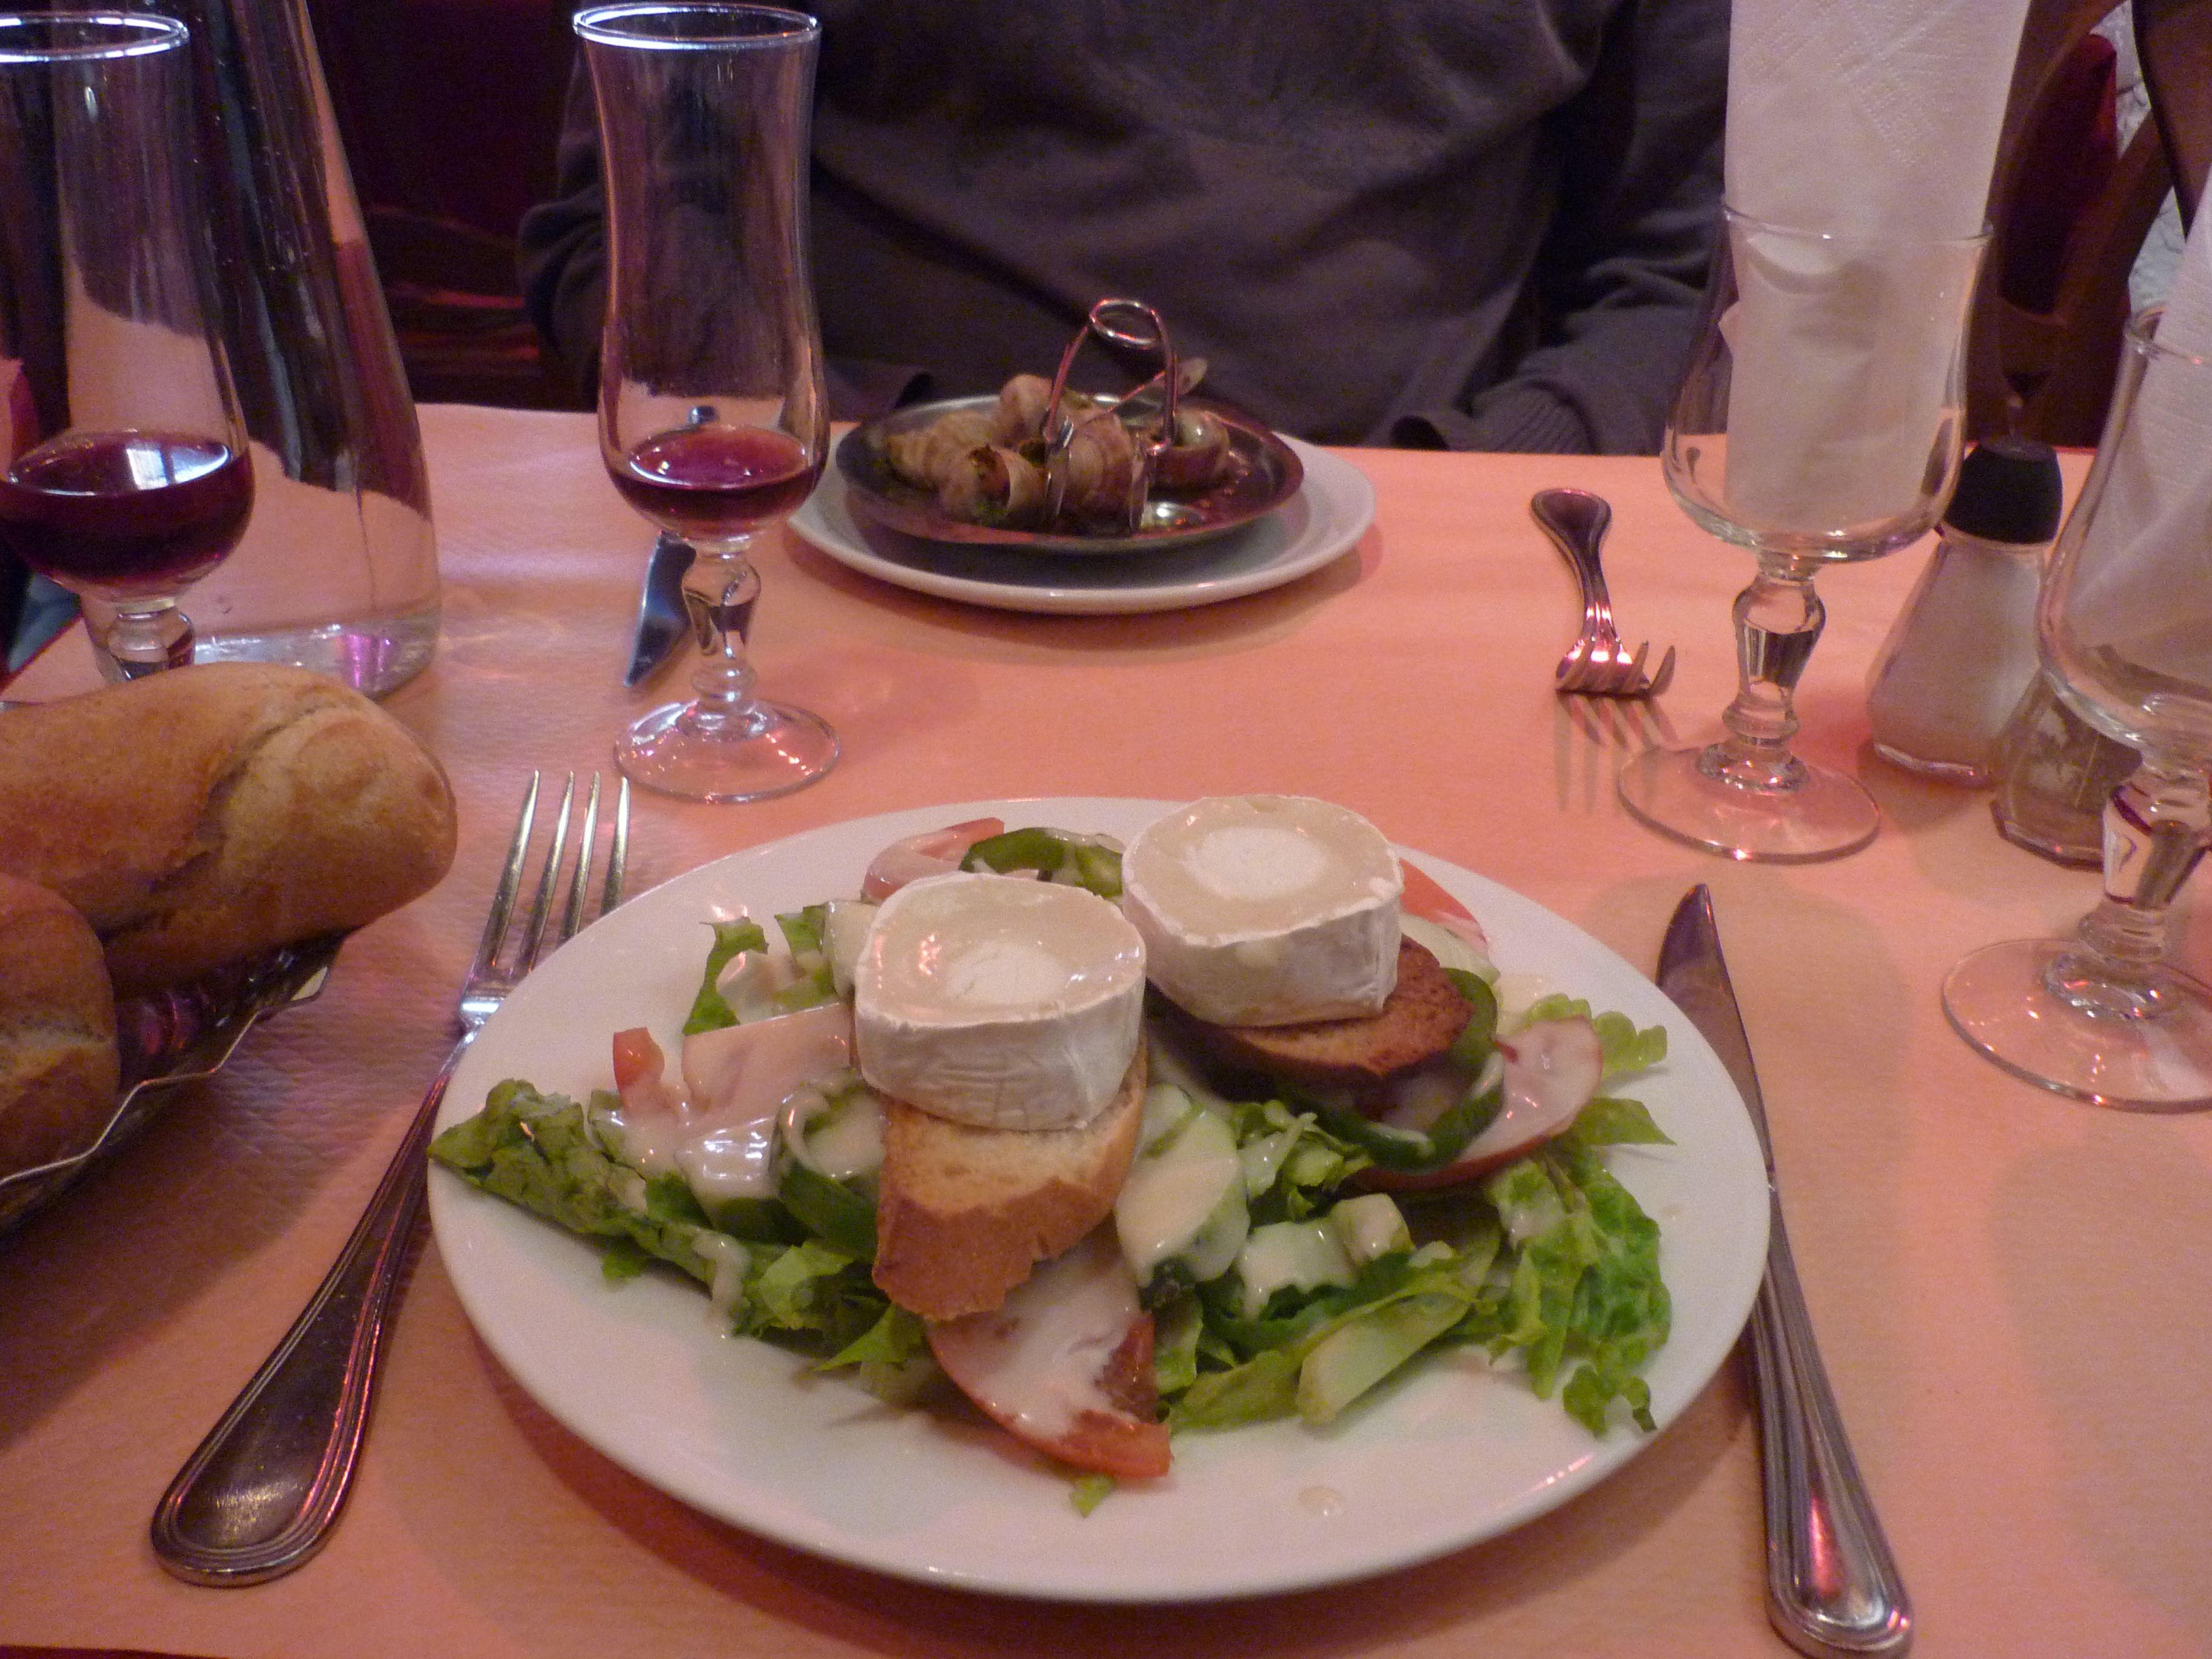 Déjeuner - Dîner #frança #comidafrancesa #france